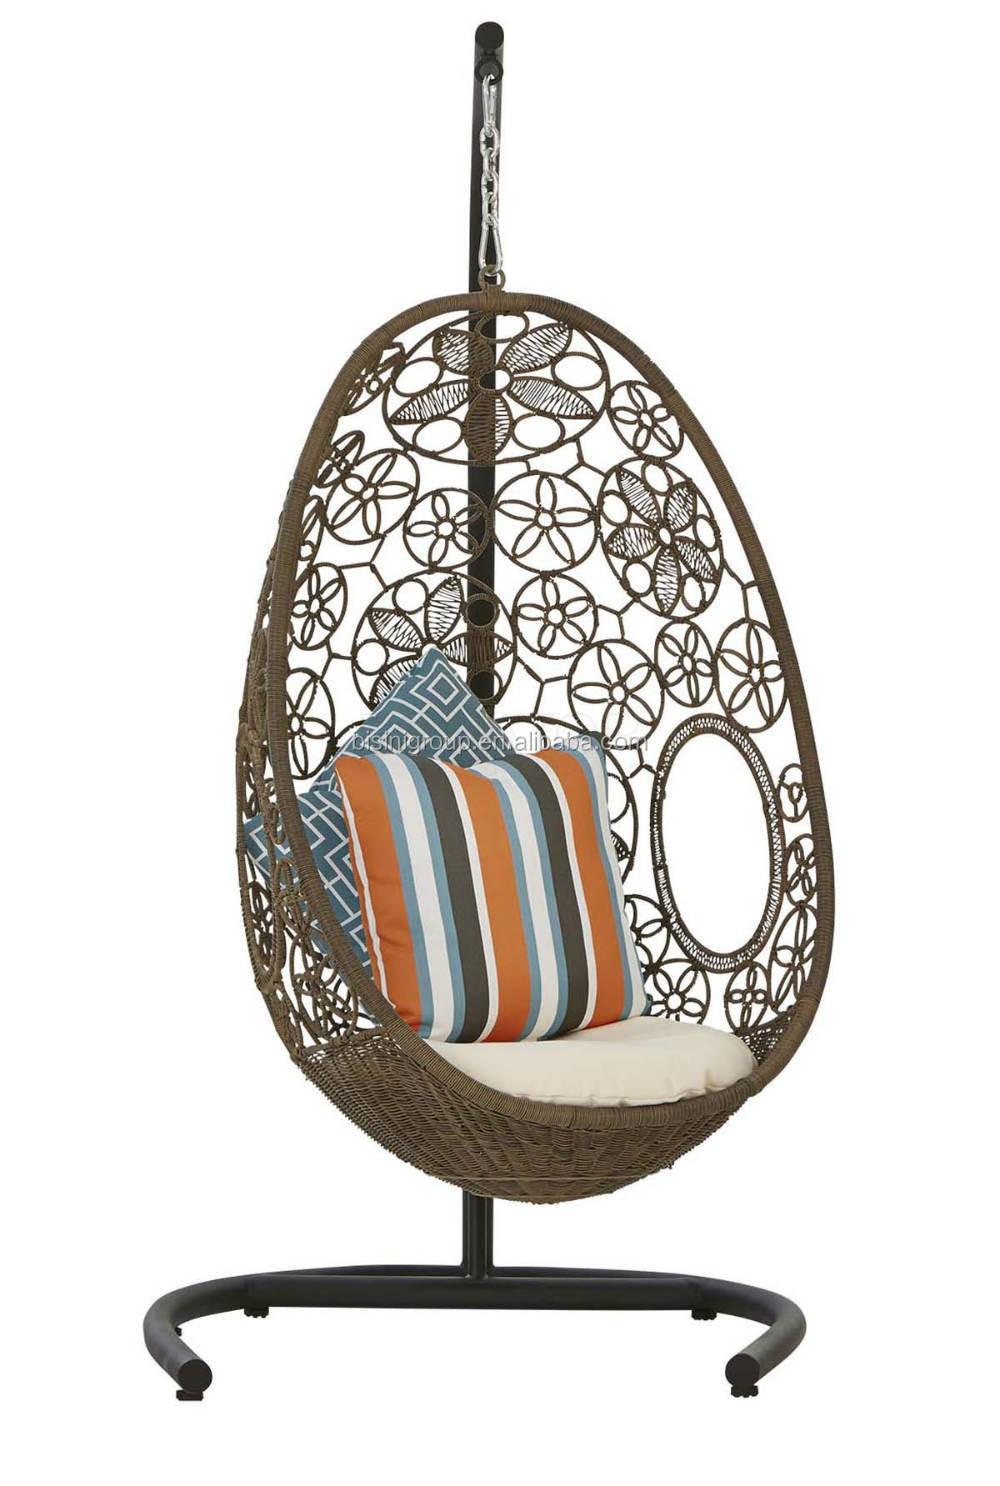 Sillon huevo colgante silln huevo retro silla colgante for Silla huevo colgante